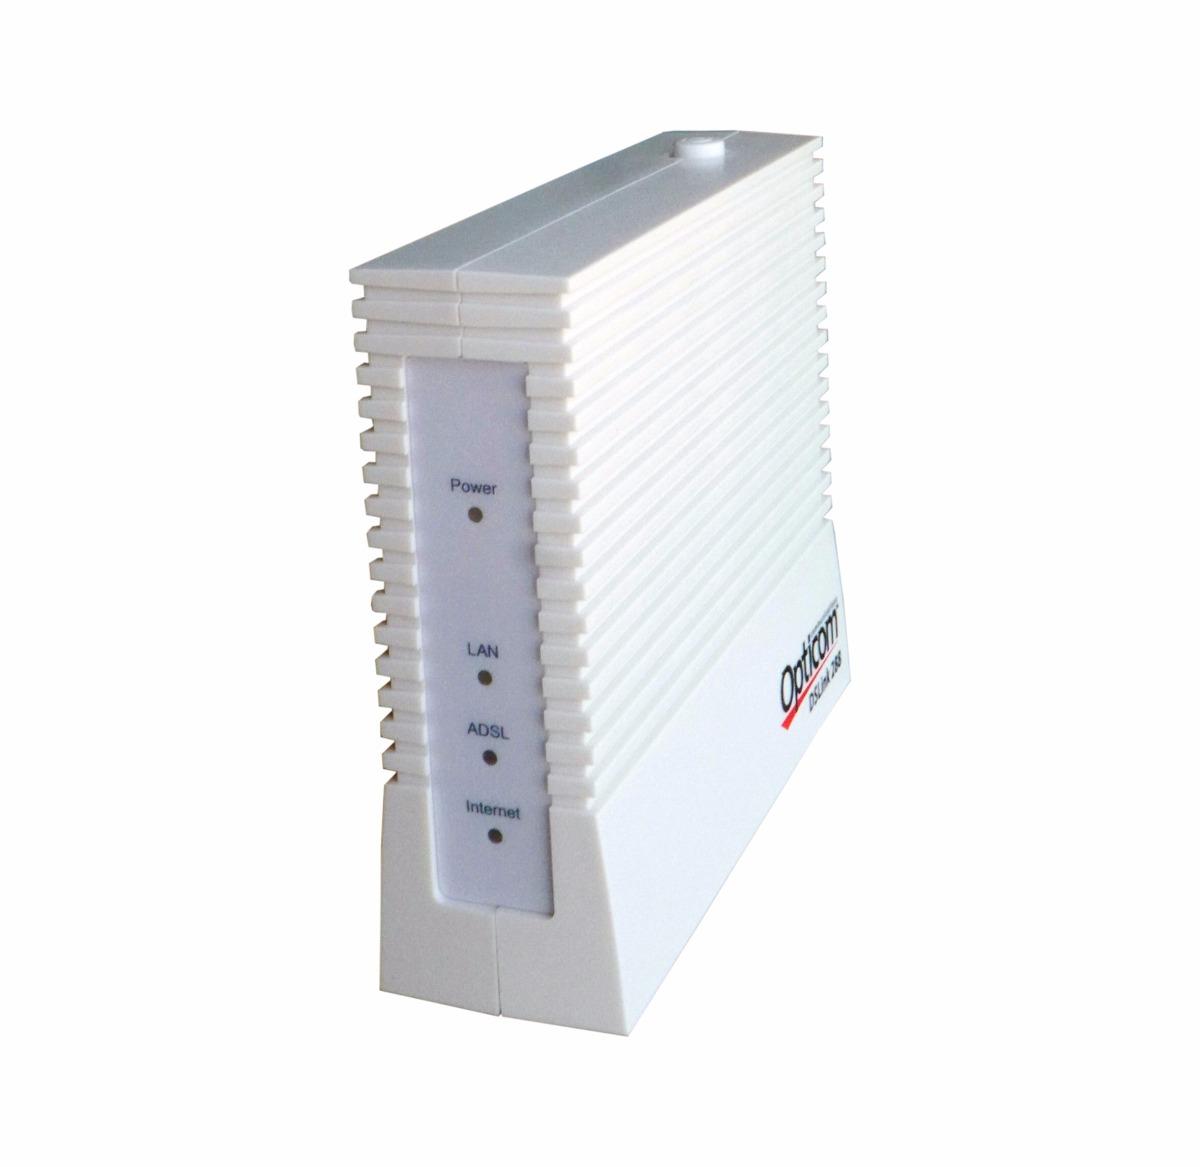 Modem Opticom Dslink 288 Speedy ADSL RJ11 RJ15